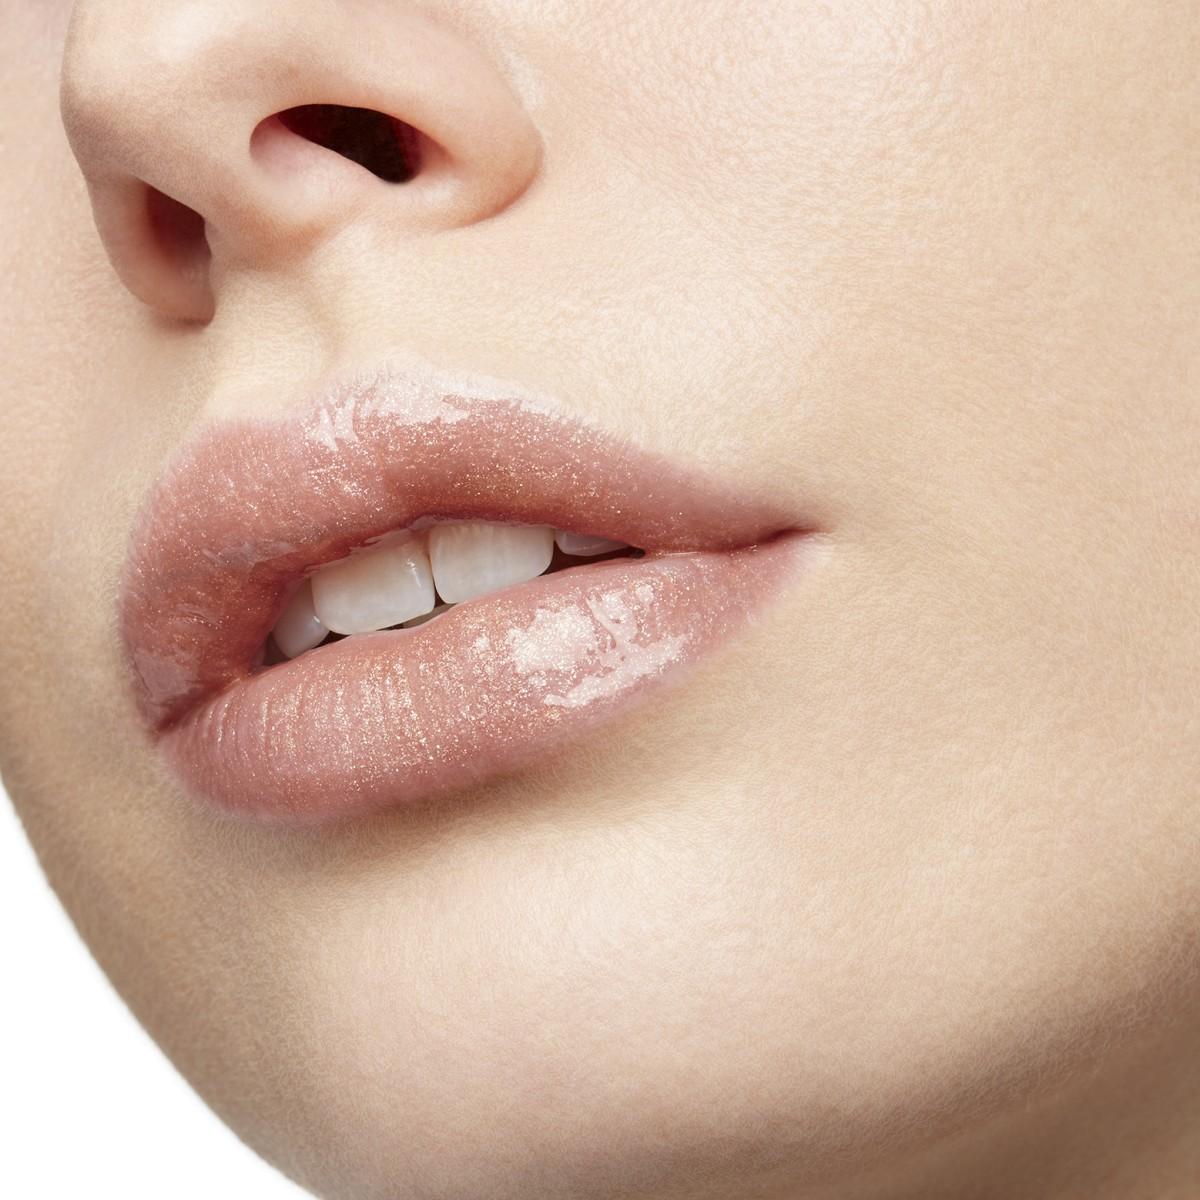 Beauté - Doracandy Loubilaque Gloss à Lèvres - Christian Louboutin